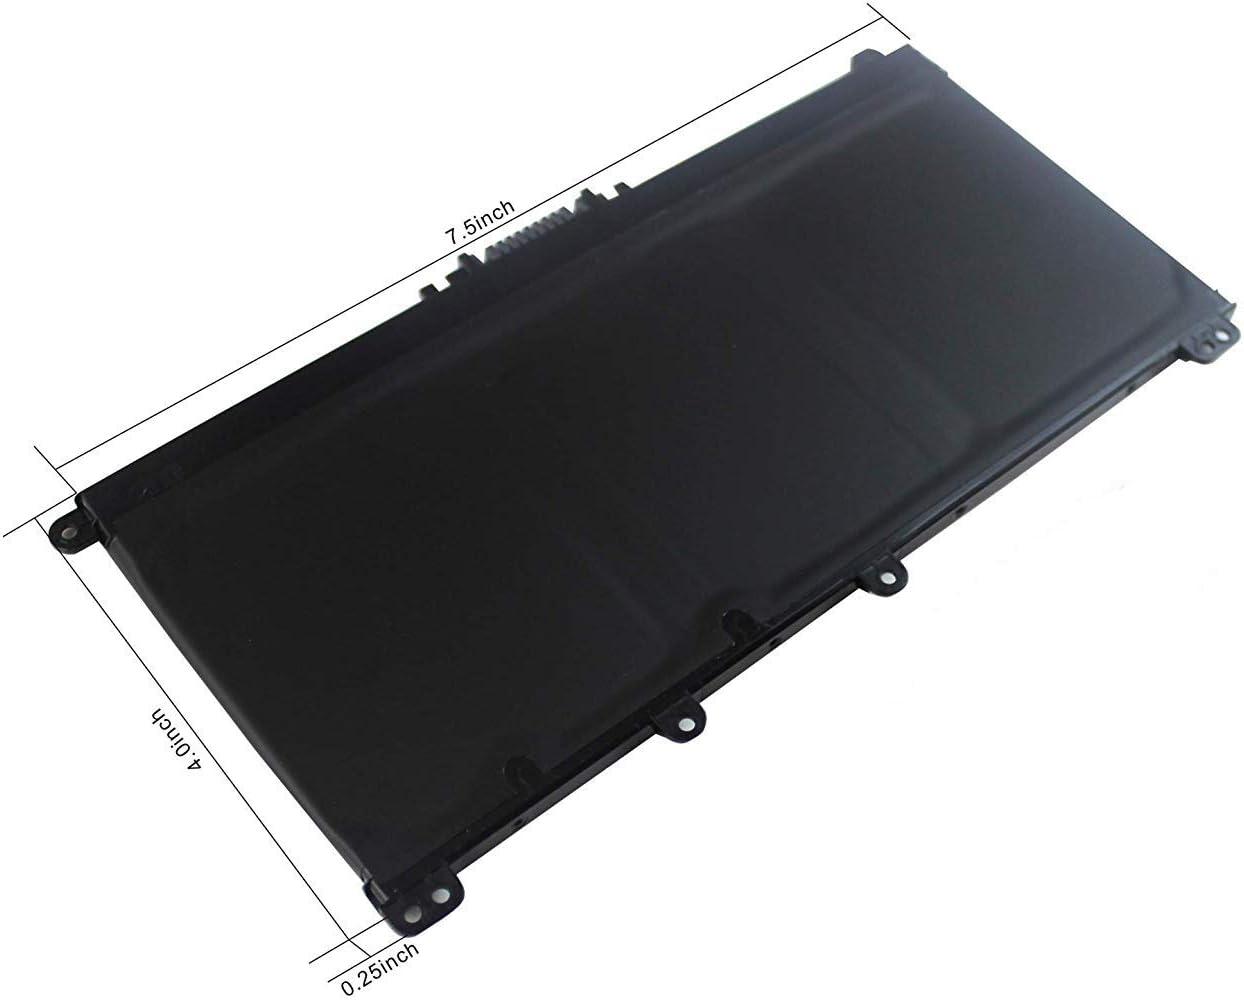 Hubei TF03XL TF03041XL 920046-421 920070-855 920046-121 Laptop Battery Compatible For HP Pavilion 17-AR050WM 17-AR007CA 15-CC 15-CD 14-BF Series HSTNN-LB7X HSTNN-IB7Y HSTNN-LB7J 11.55V 41.7Wh